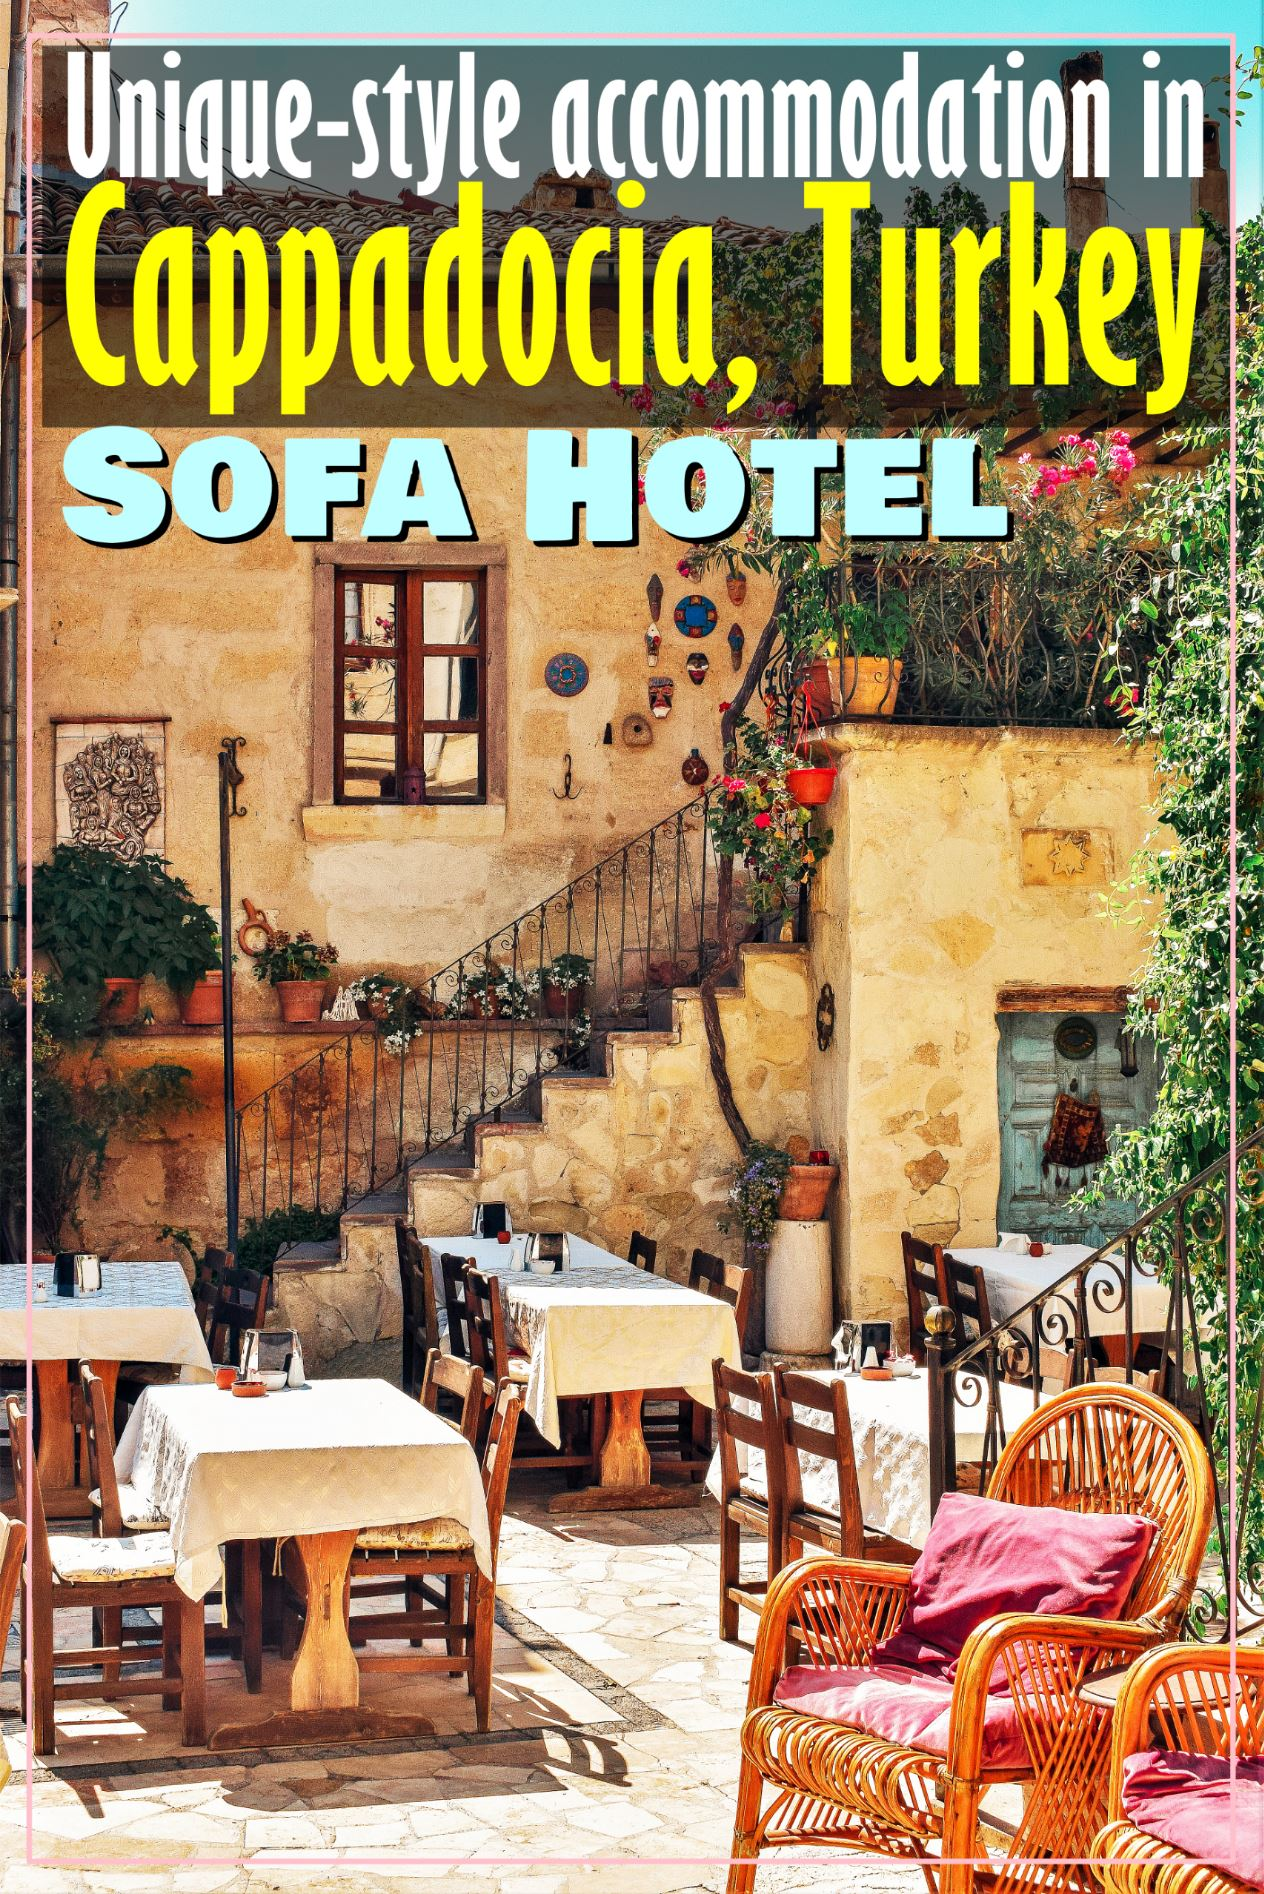 Sofa Hotel Cappadocia Turkey